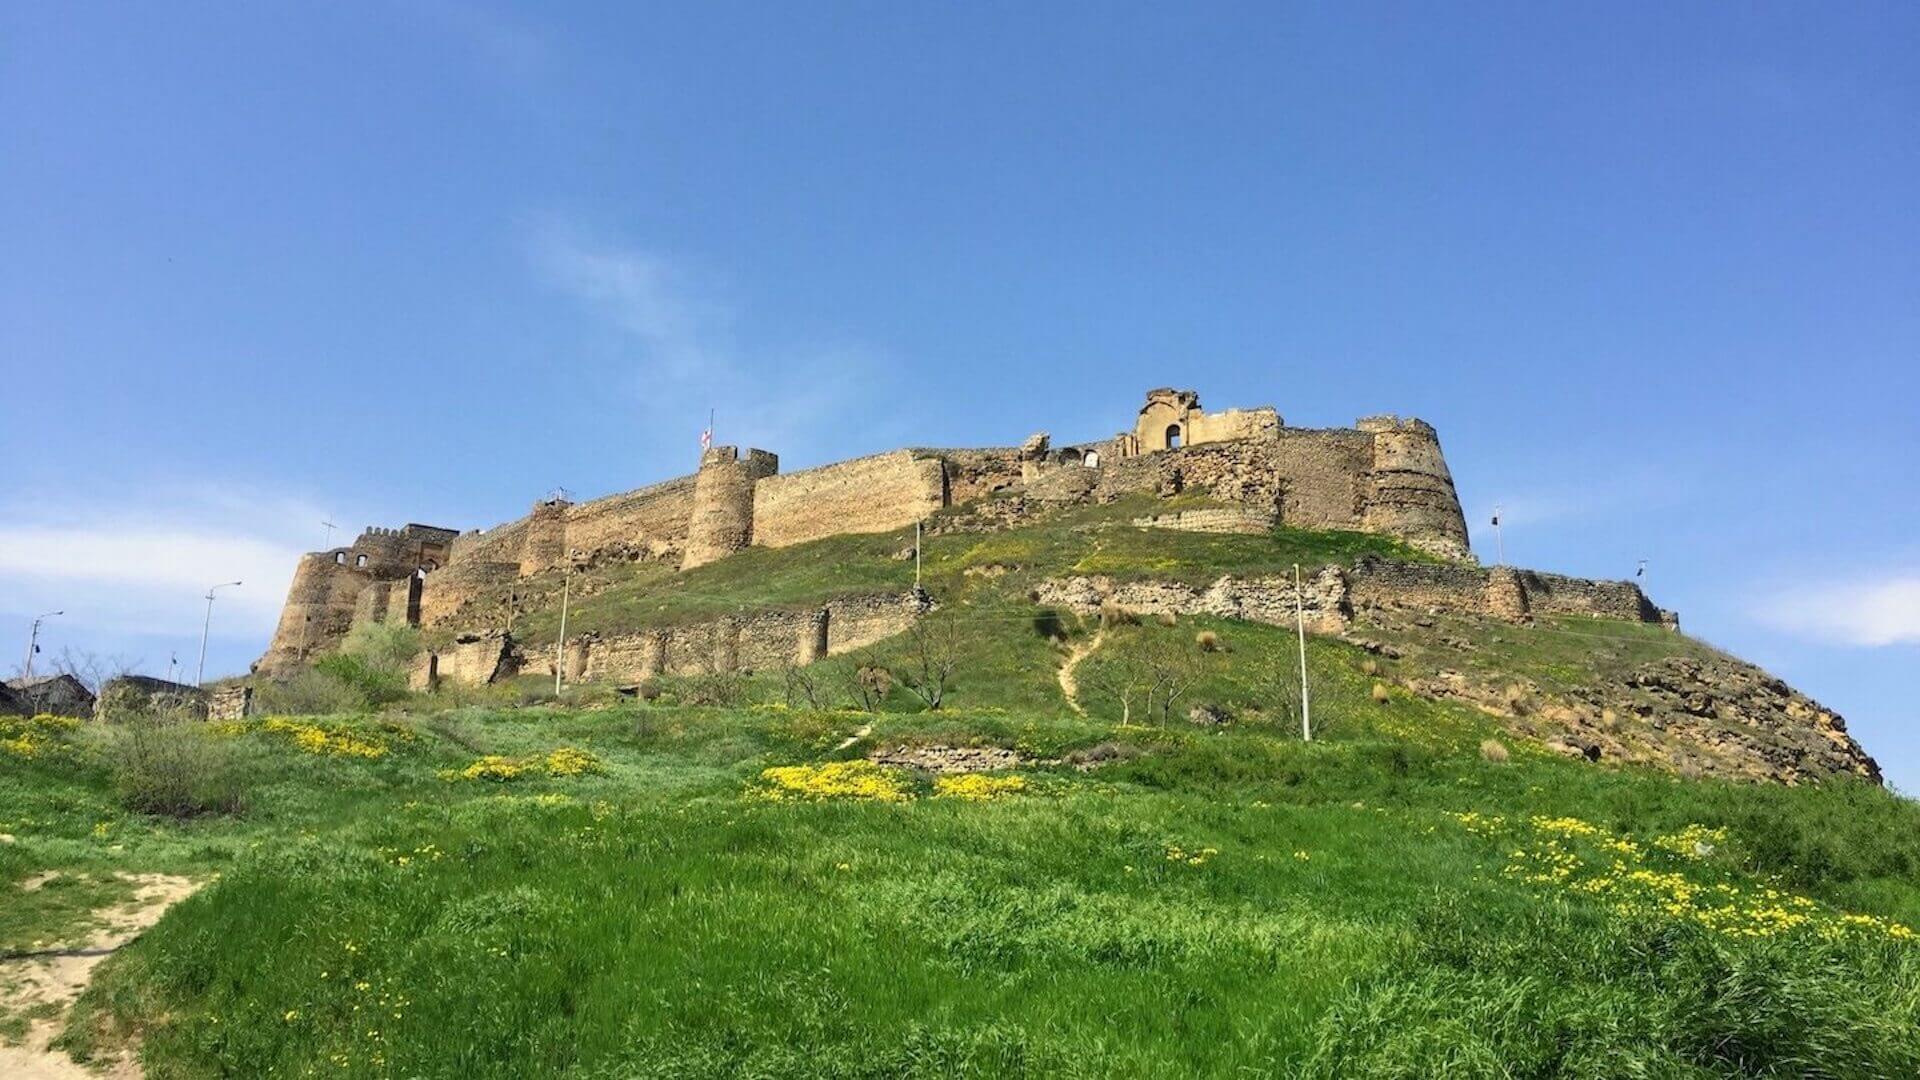 De citadel van Gori in Georgië